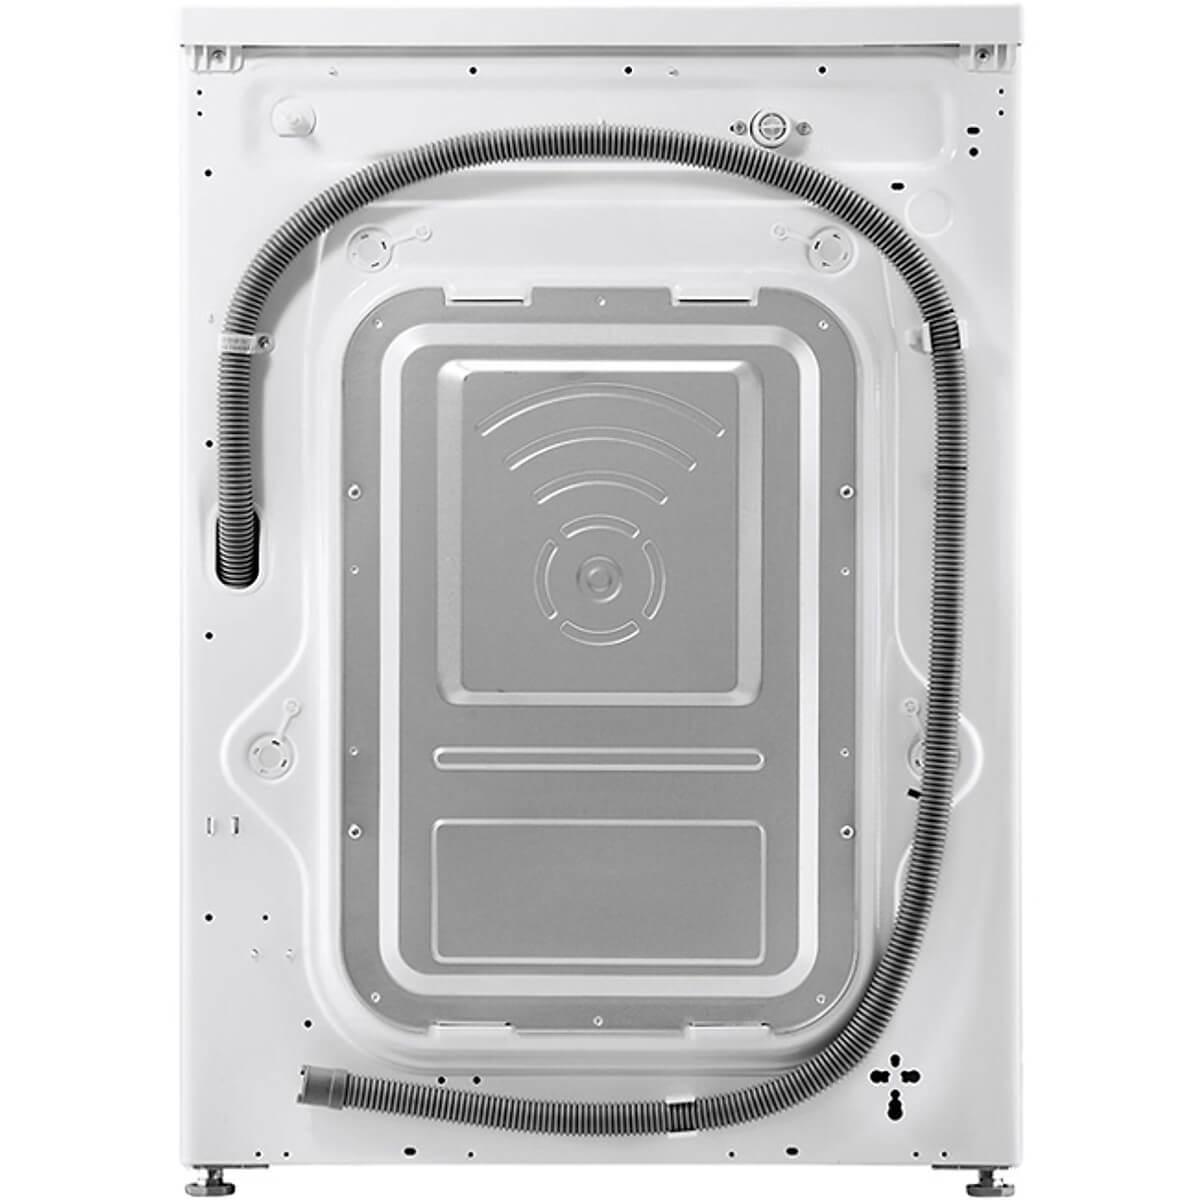 Máy Giặt Cửa Trước Inverter LG FM1208N6W (8kg)